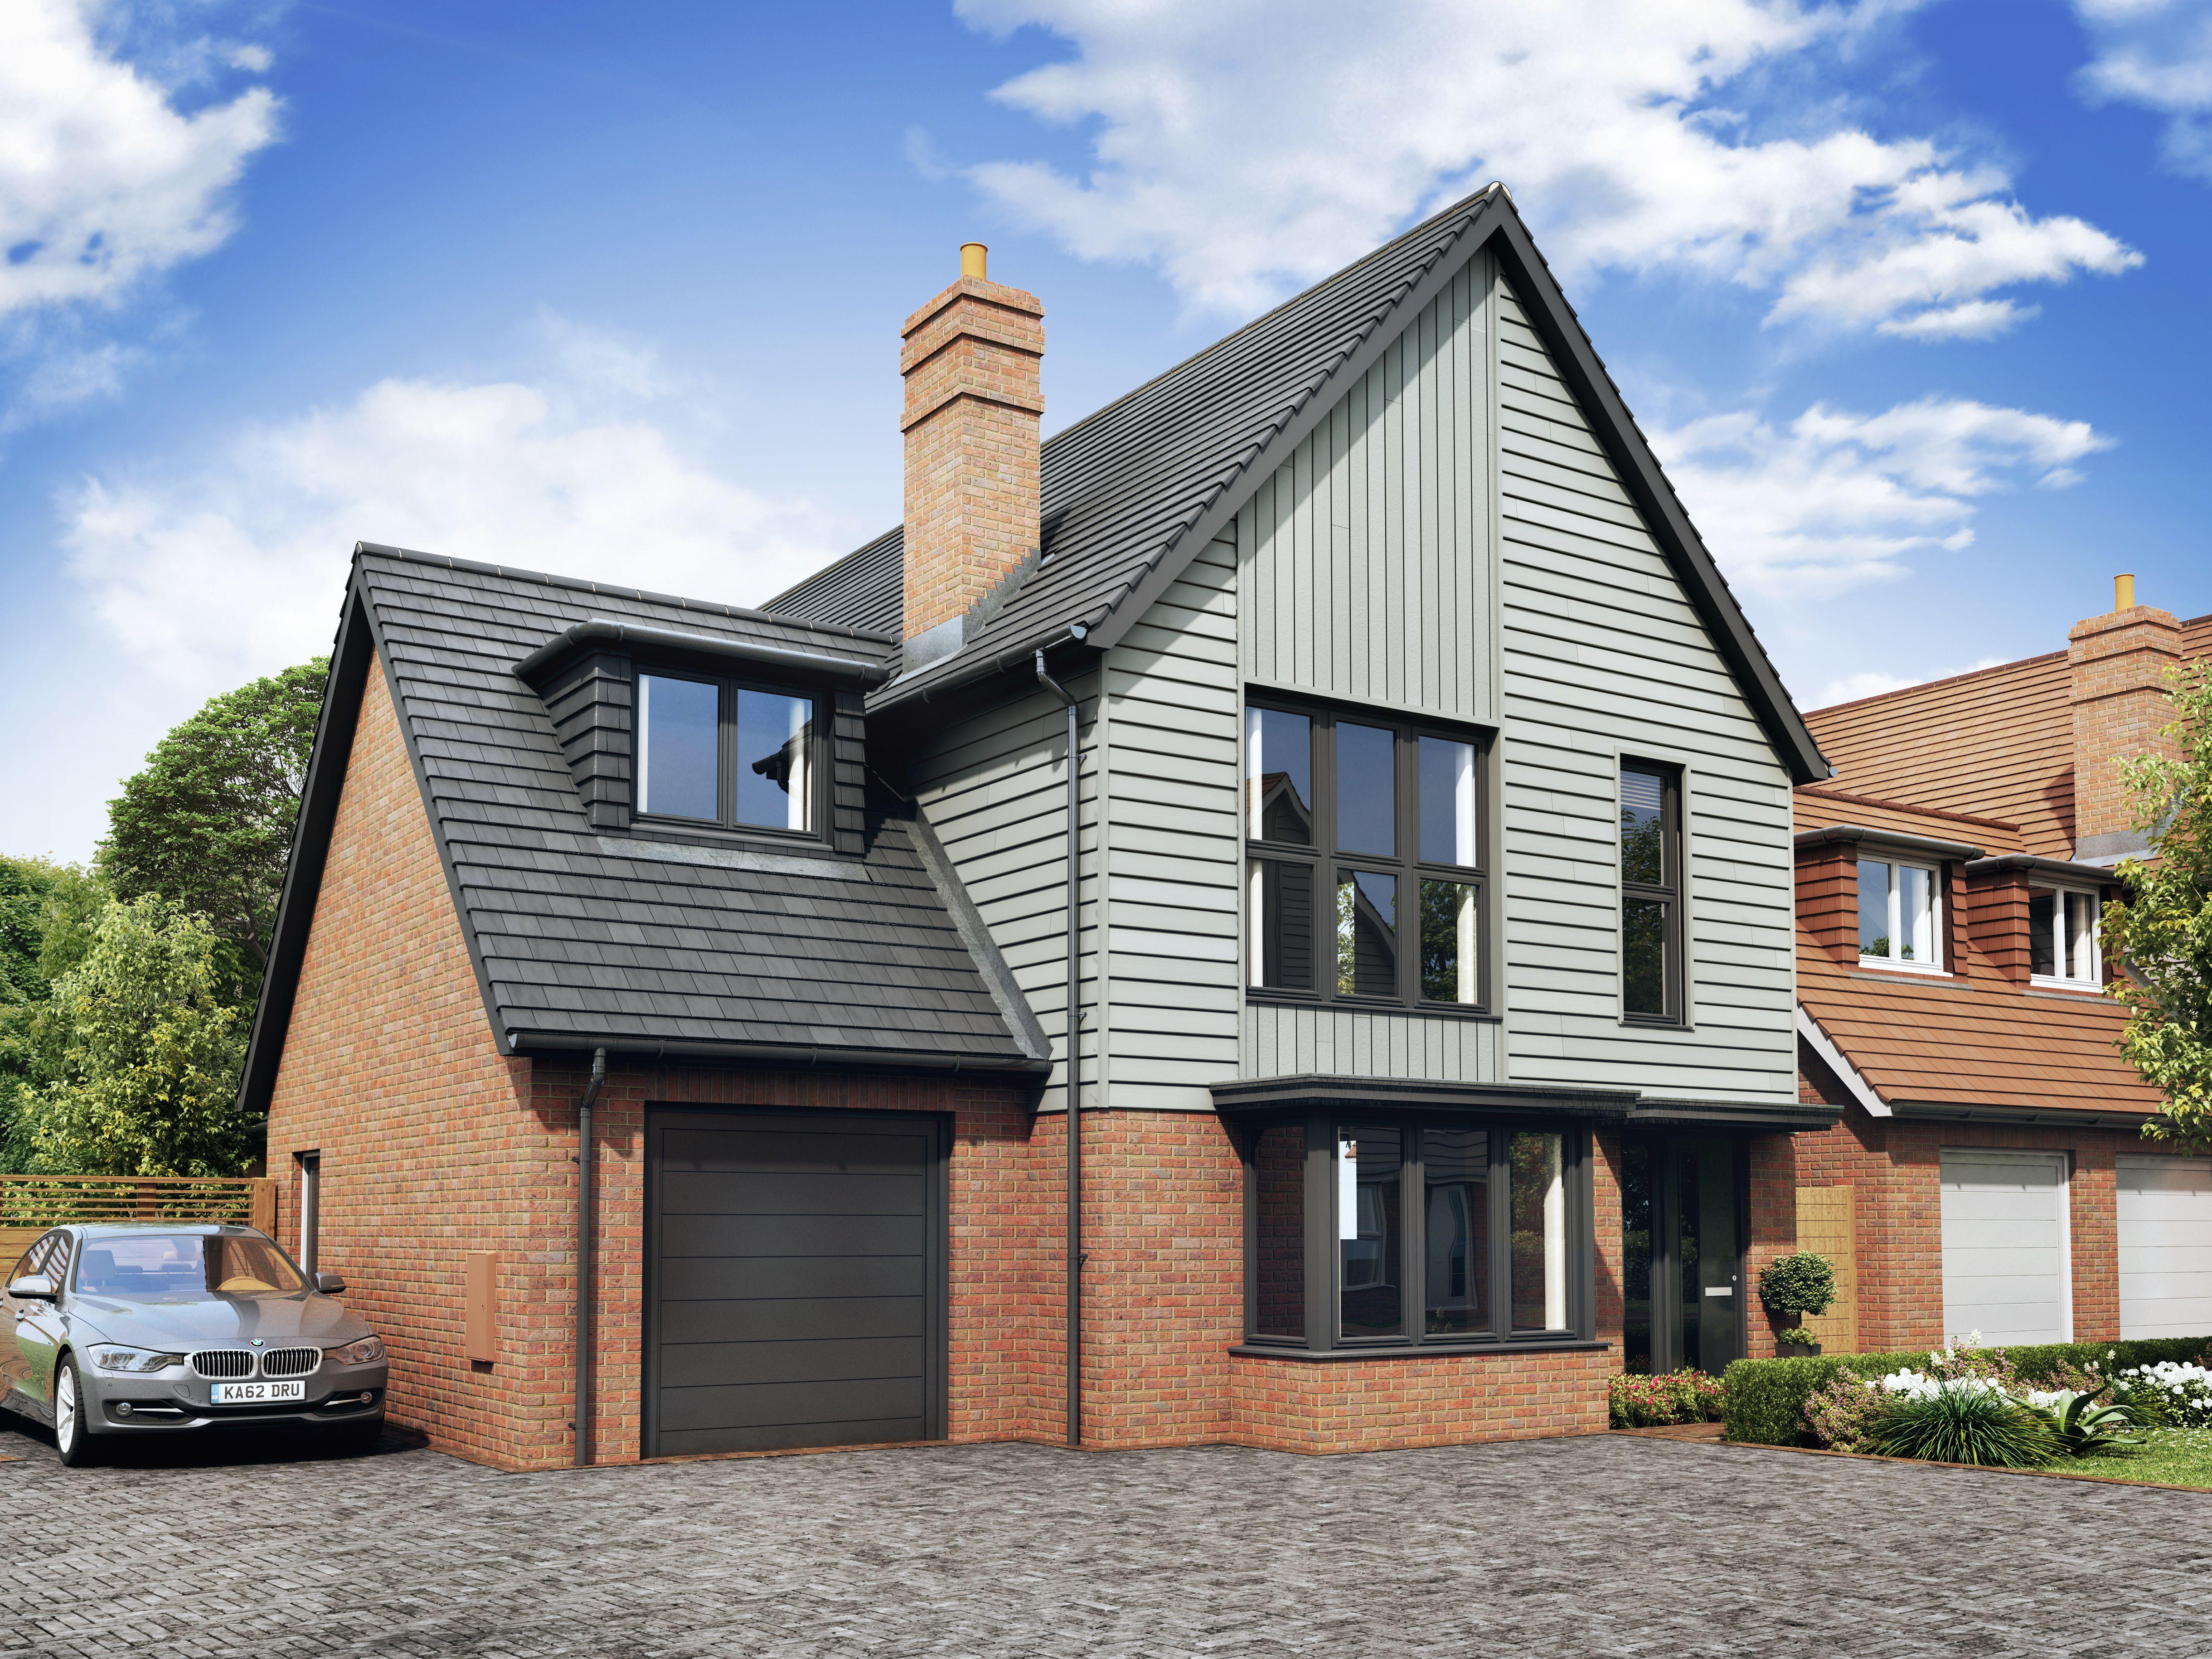 The Cambridge home at Terlingham Rise, Hawkinge near